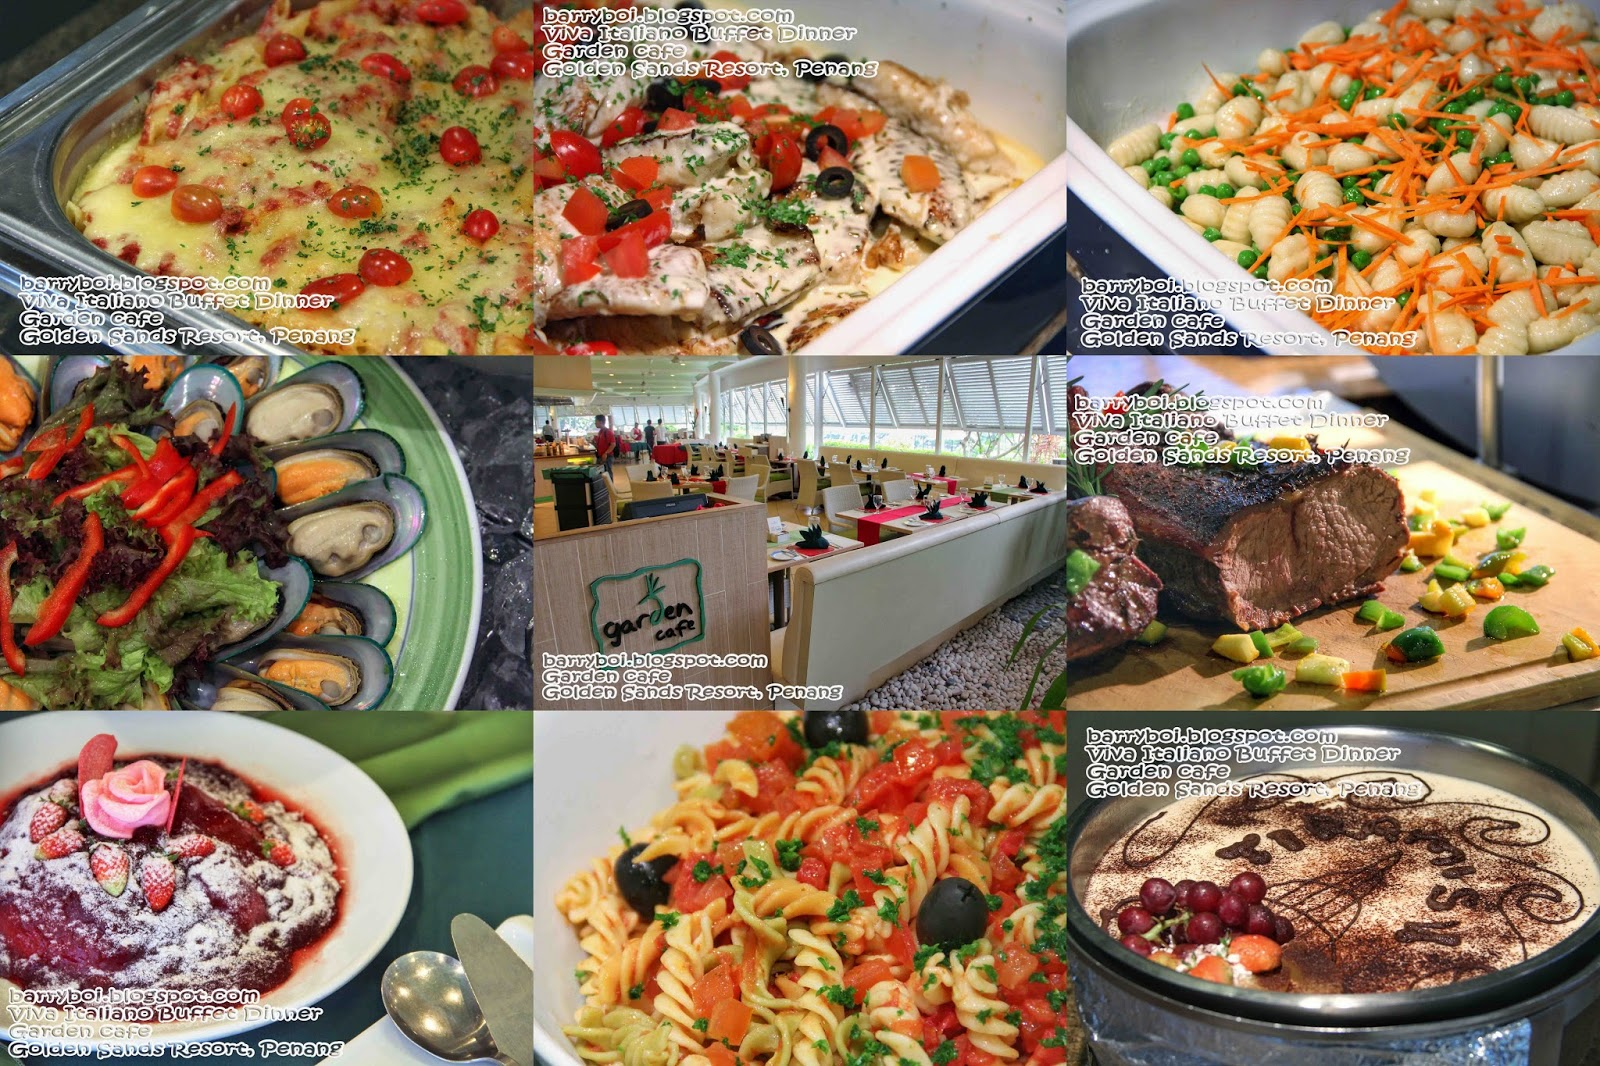 Daily Moments by BarryBoi: Viva Italiano Buffet Dinner at Garden Cafe ...